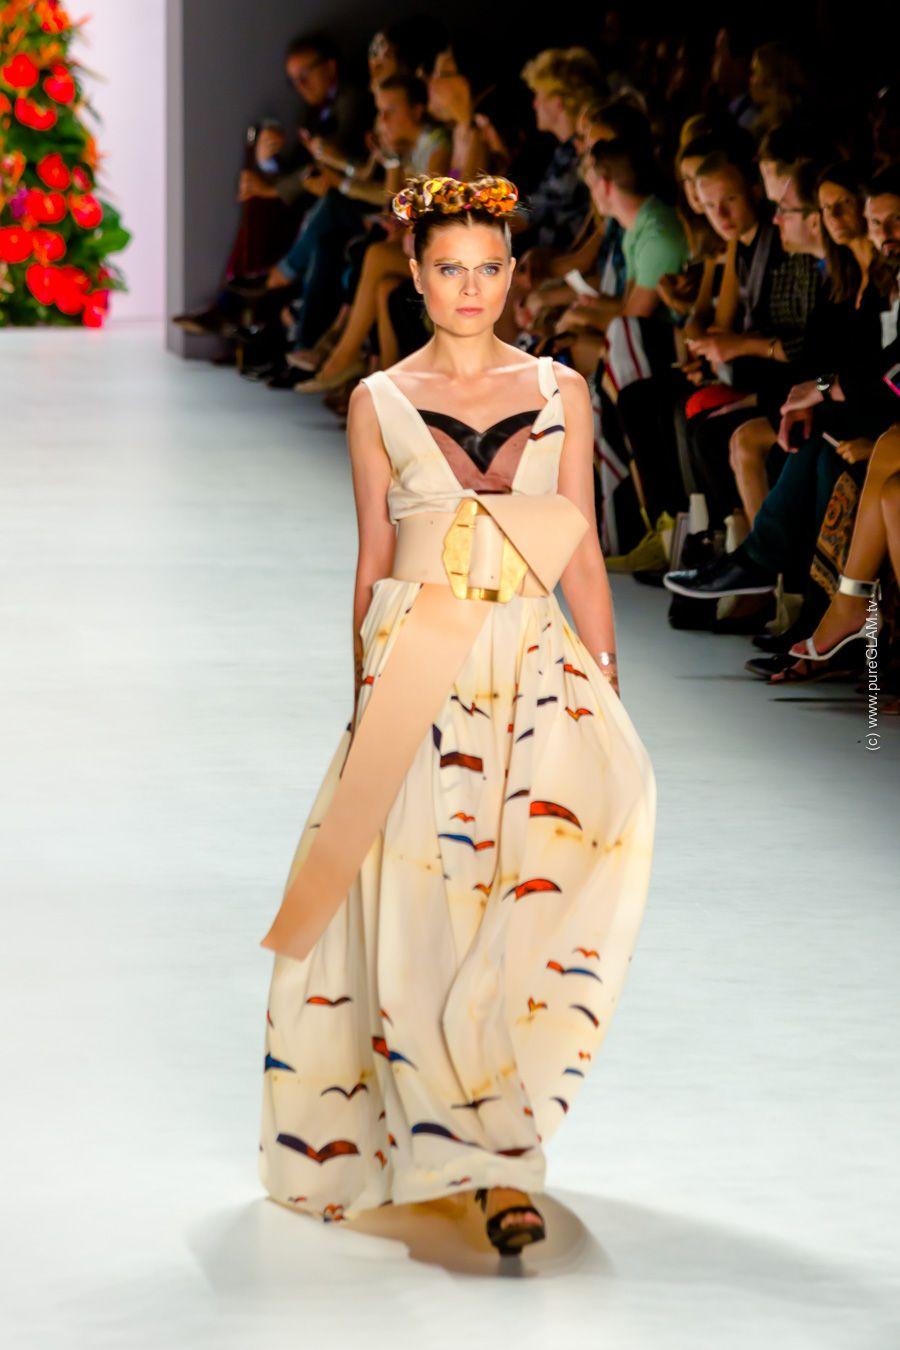 Rebekka Ruétz Fashionshow A Touch Of Frida Fashionweek Ootd Spring